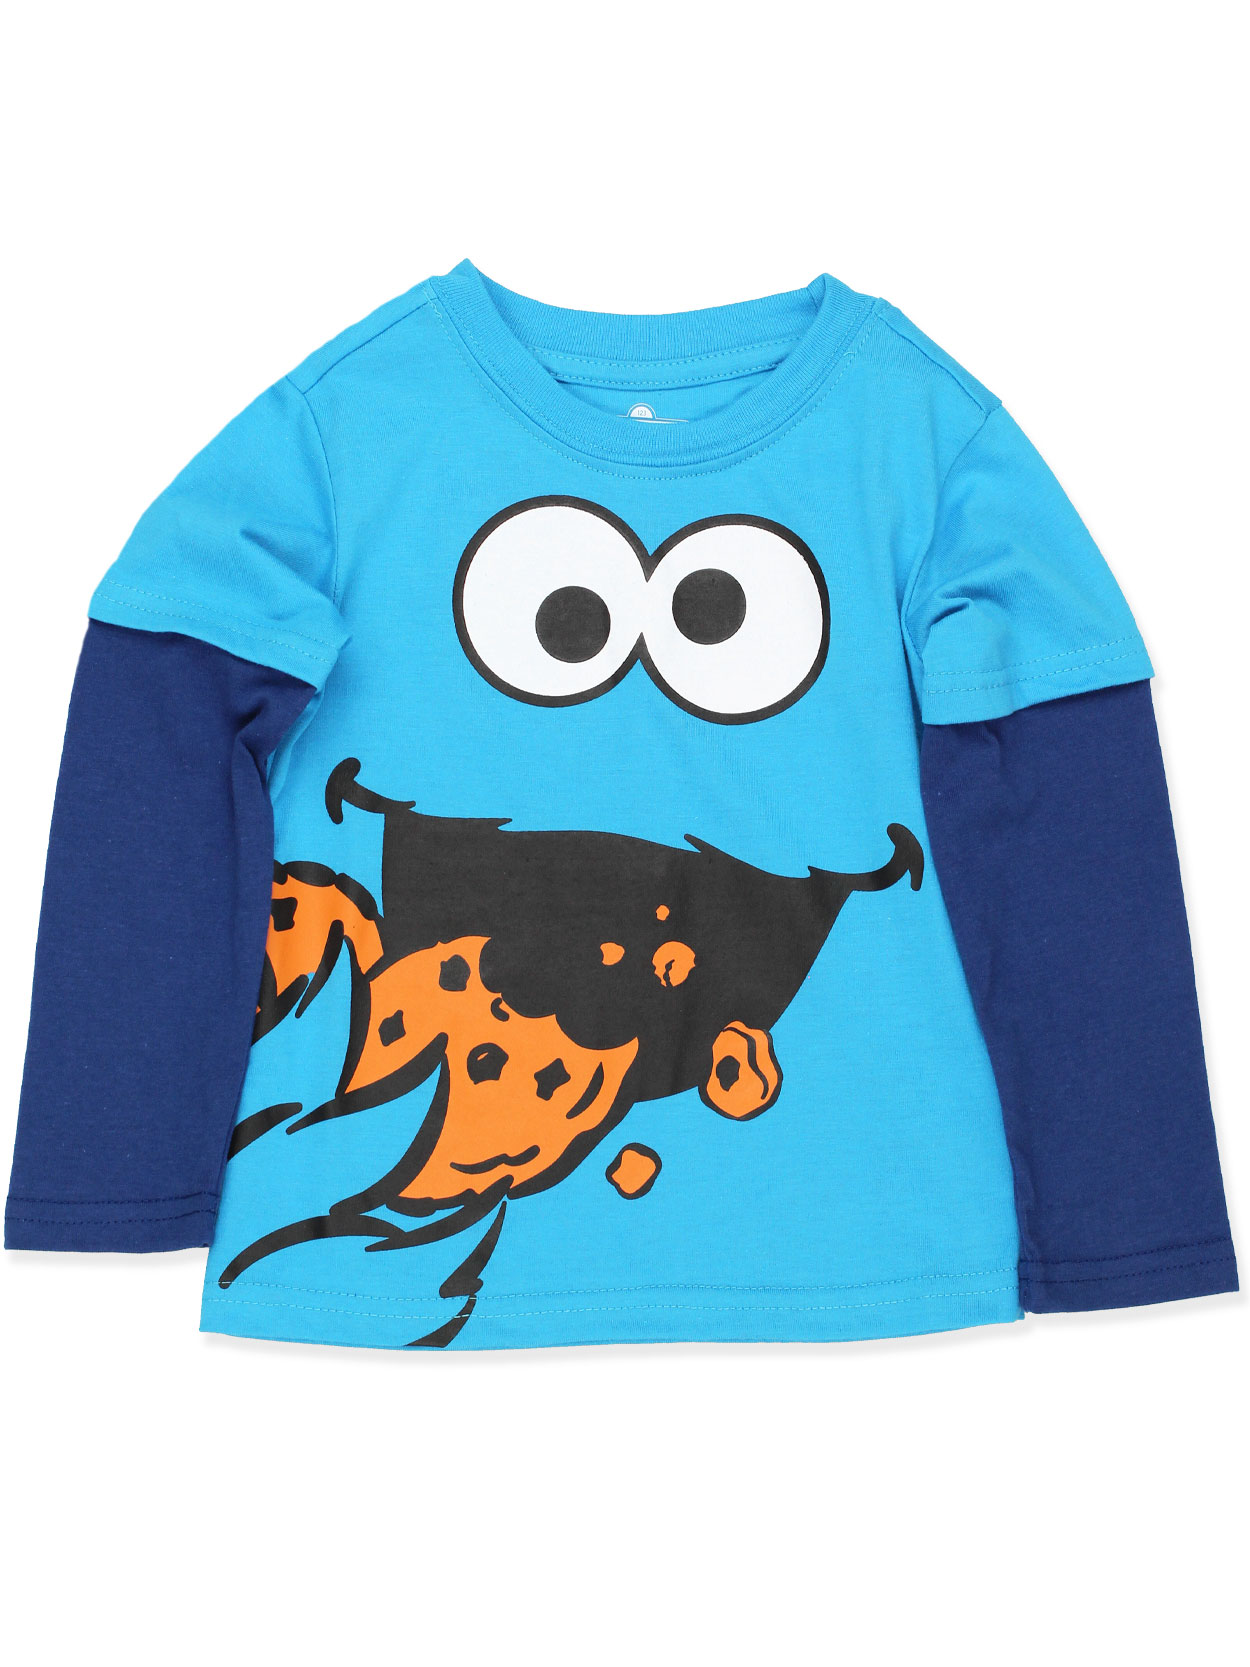 Sesame Street Cookie Monster Toddler Boys Long Sleeve Tee ASCB404